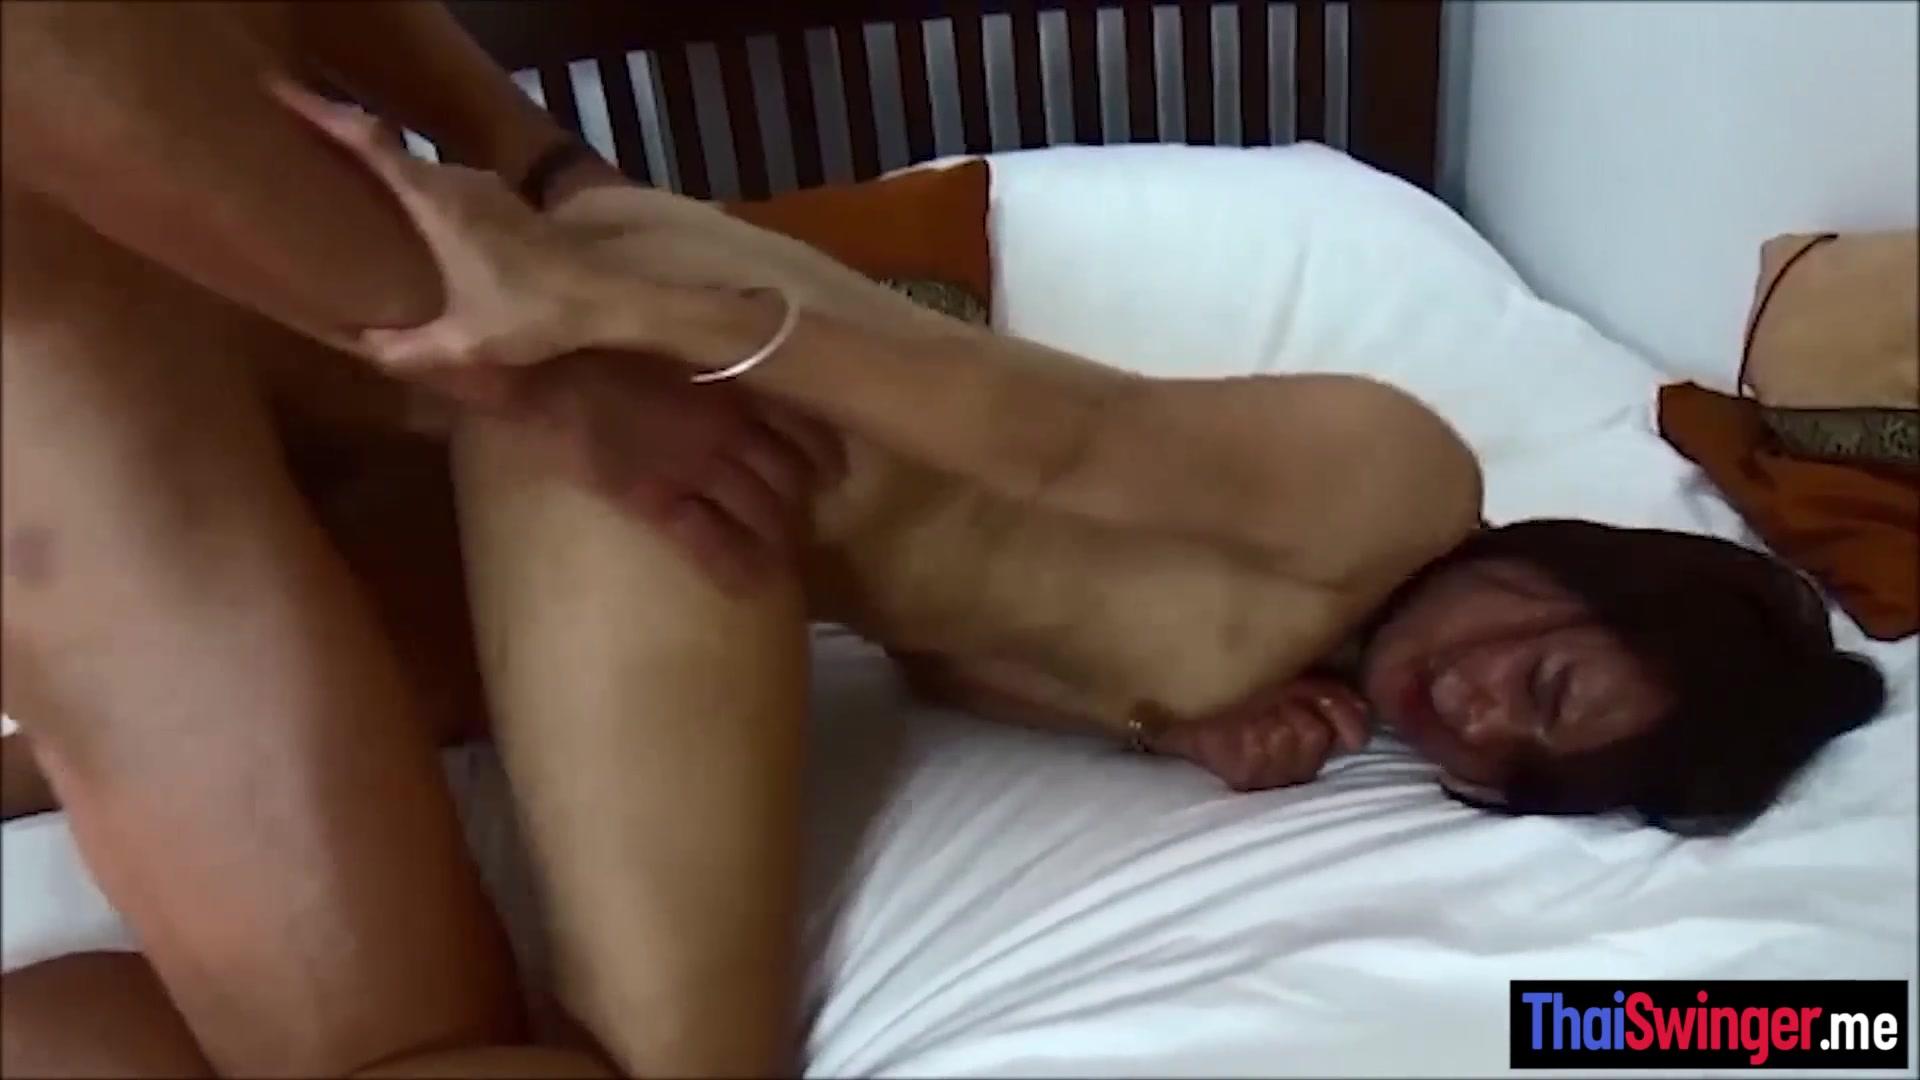 Nasty Cuckold Porn Videos real amateur cuckold thai milf wifey having nasty sex